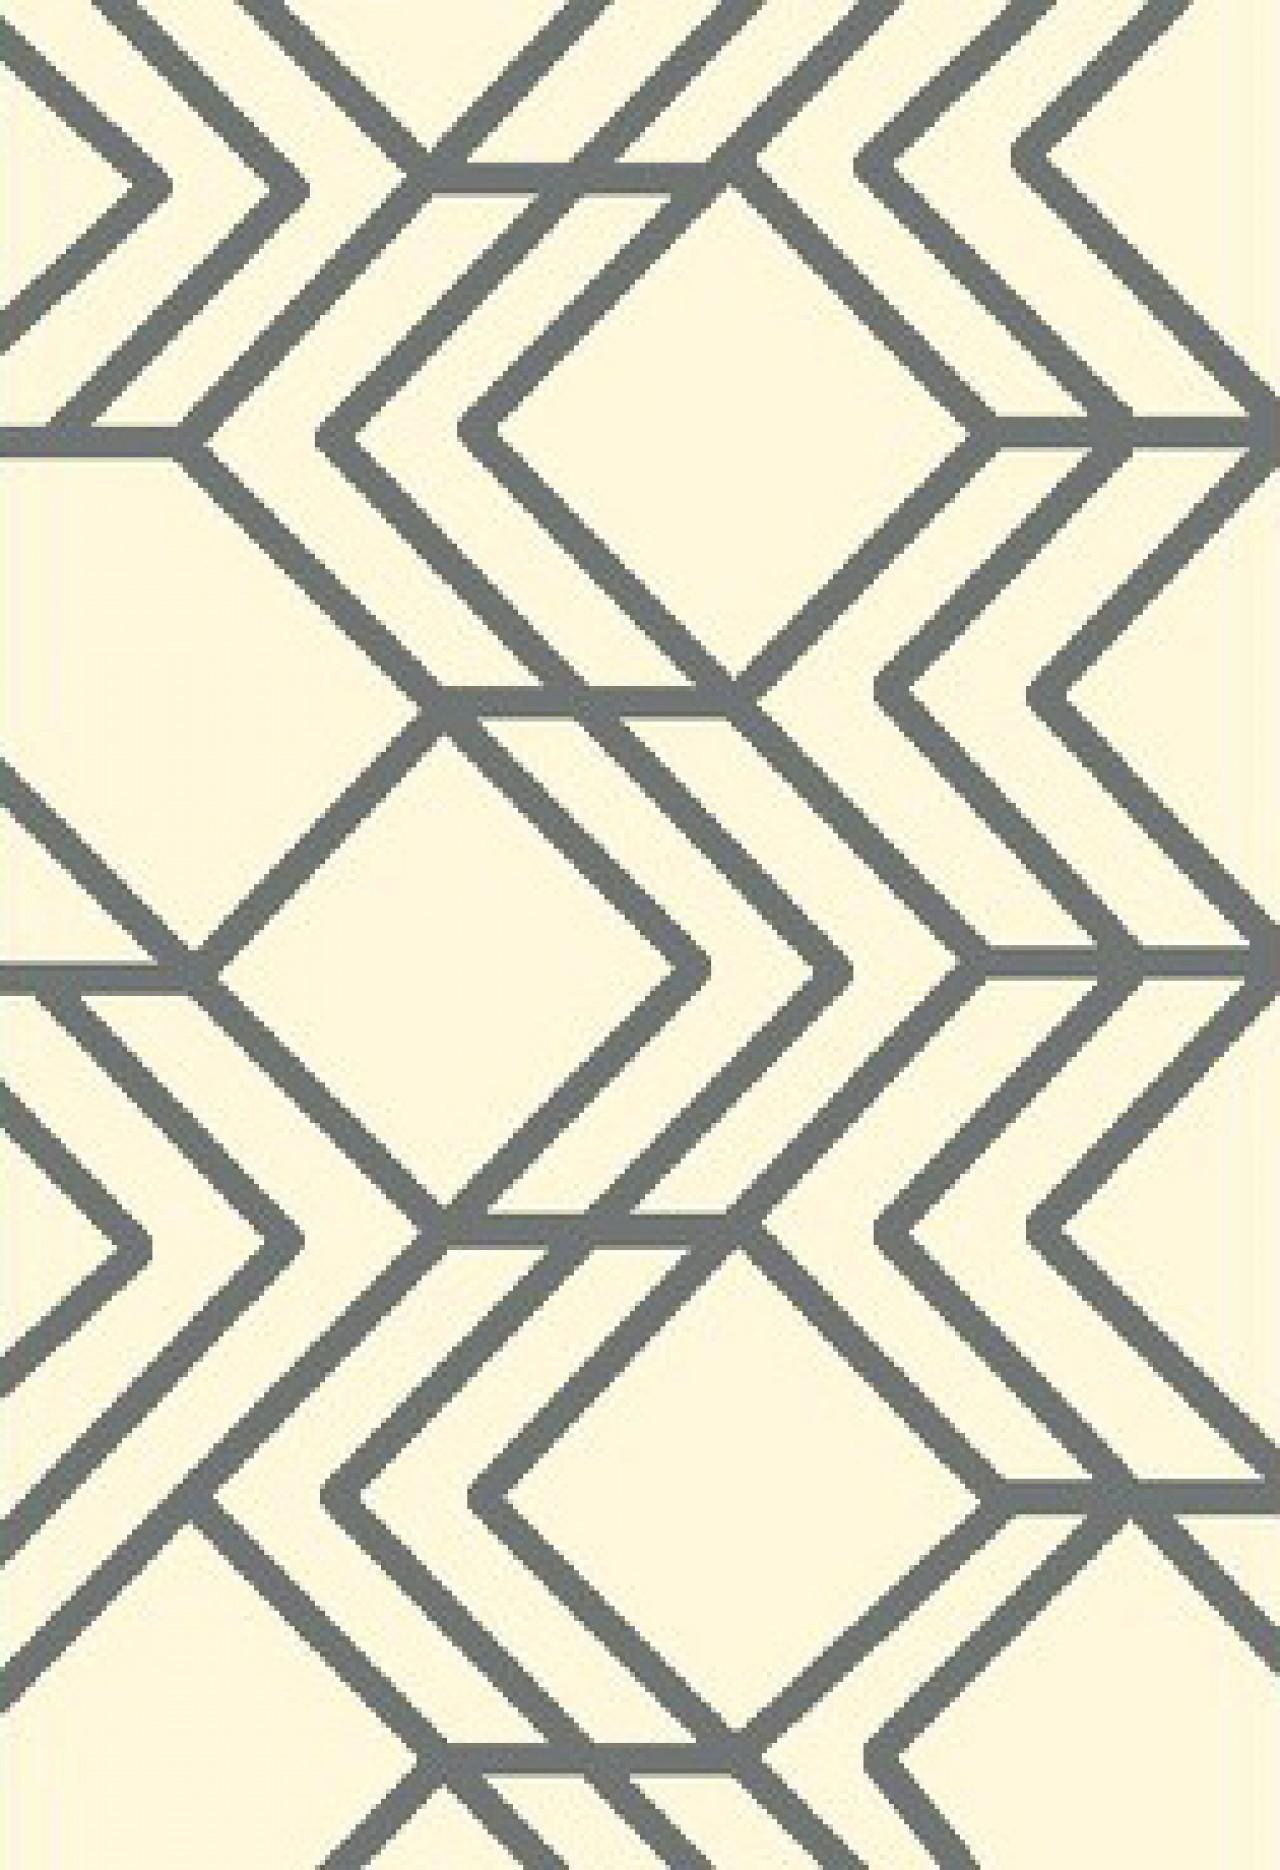 tapiso art shaggy hochflor teppich geometrische zick. Black Bedroom Furniture Sets. Home Design Ideas